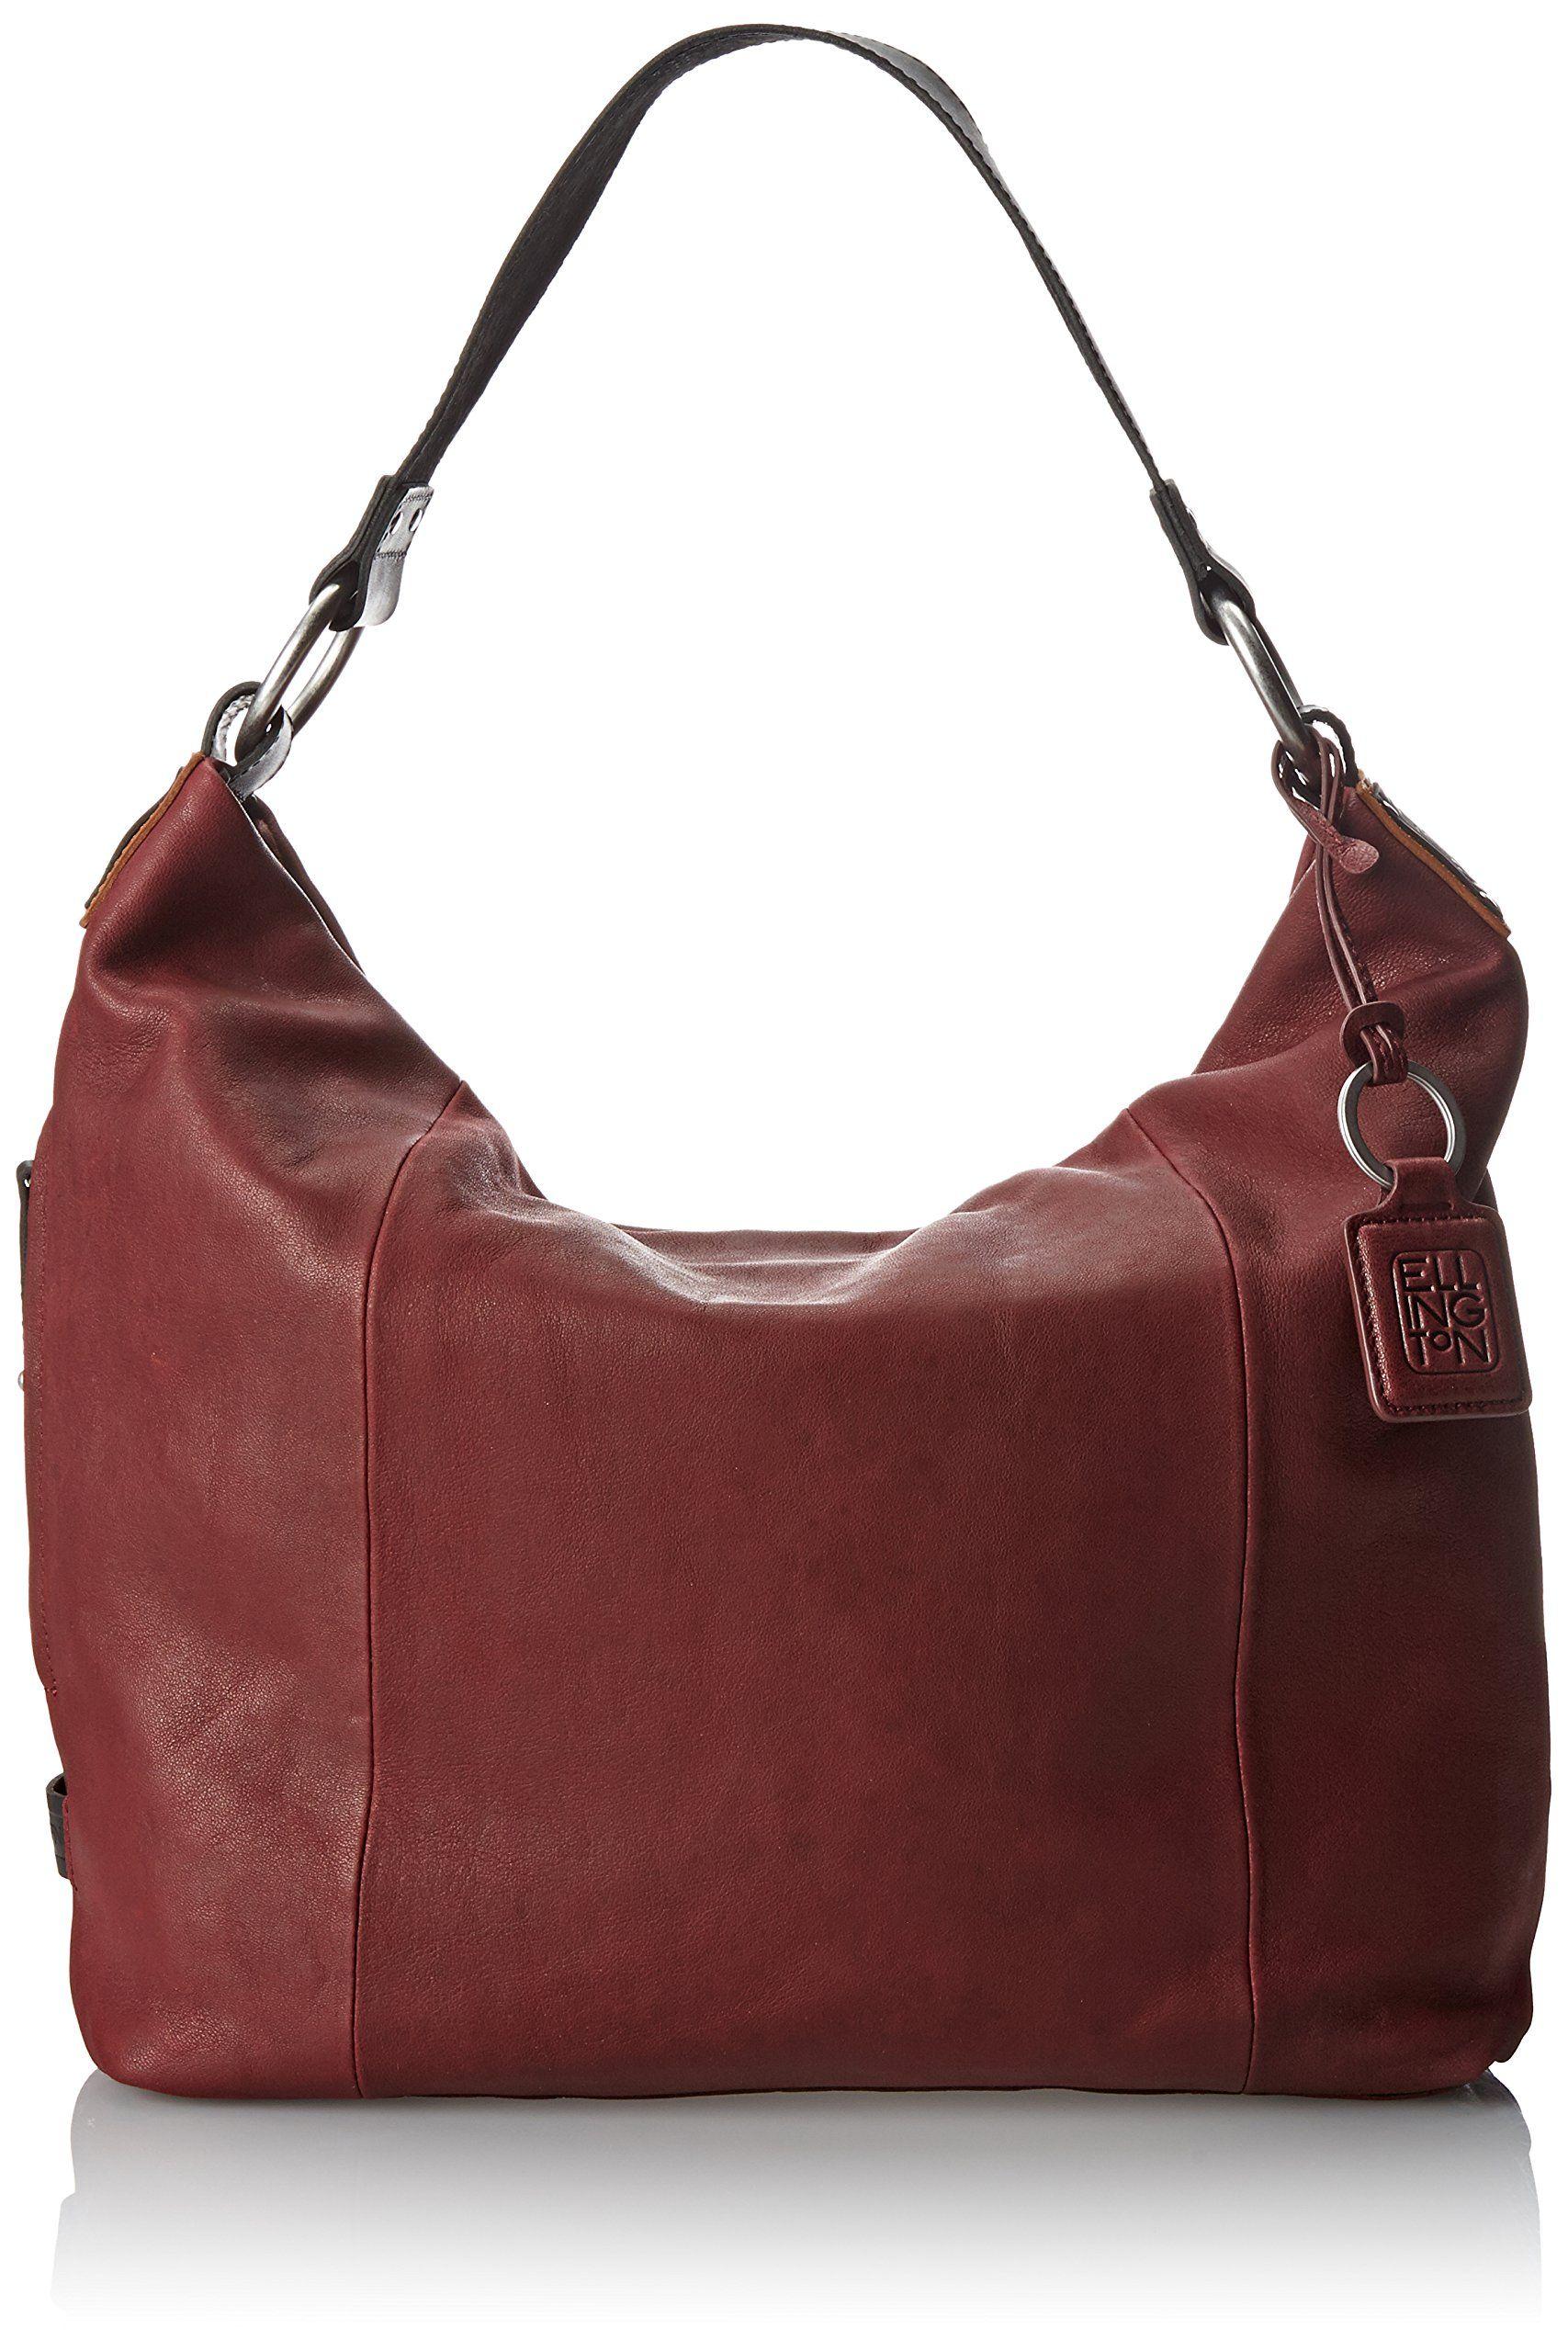 3e6b402f607f4e ellington Sadie Hobo Shoulder Bag, Light Gray, One Size: Handbags:  Amazon.com